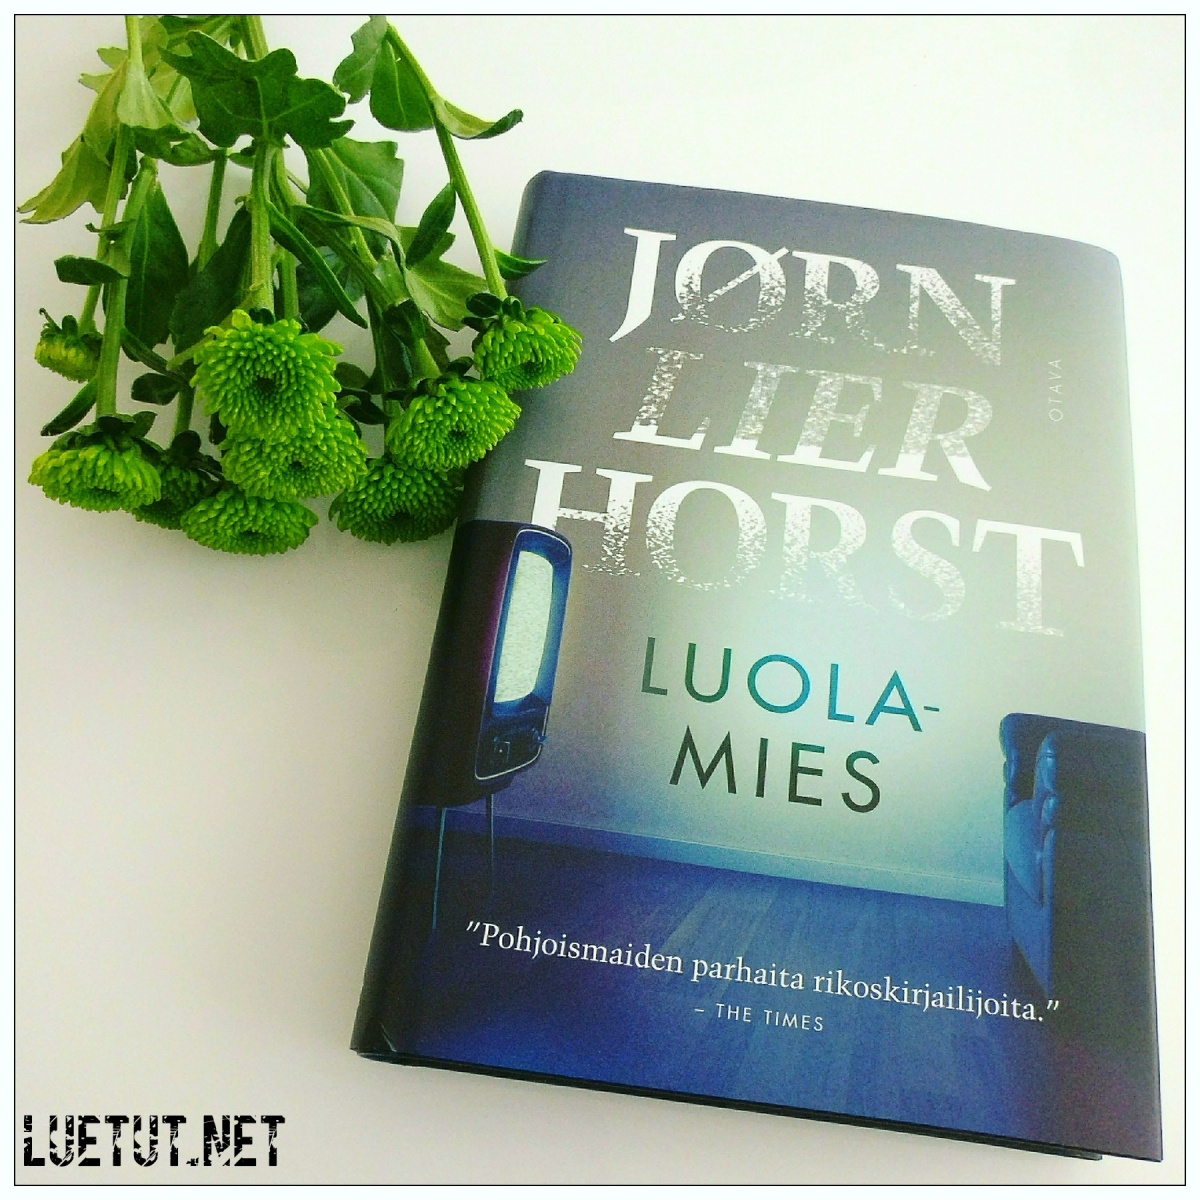 Jørn Lier Horst: Luolamies